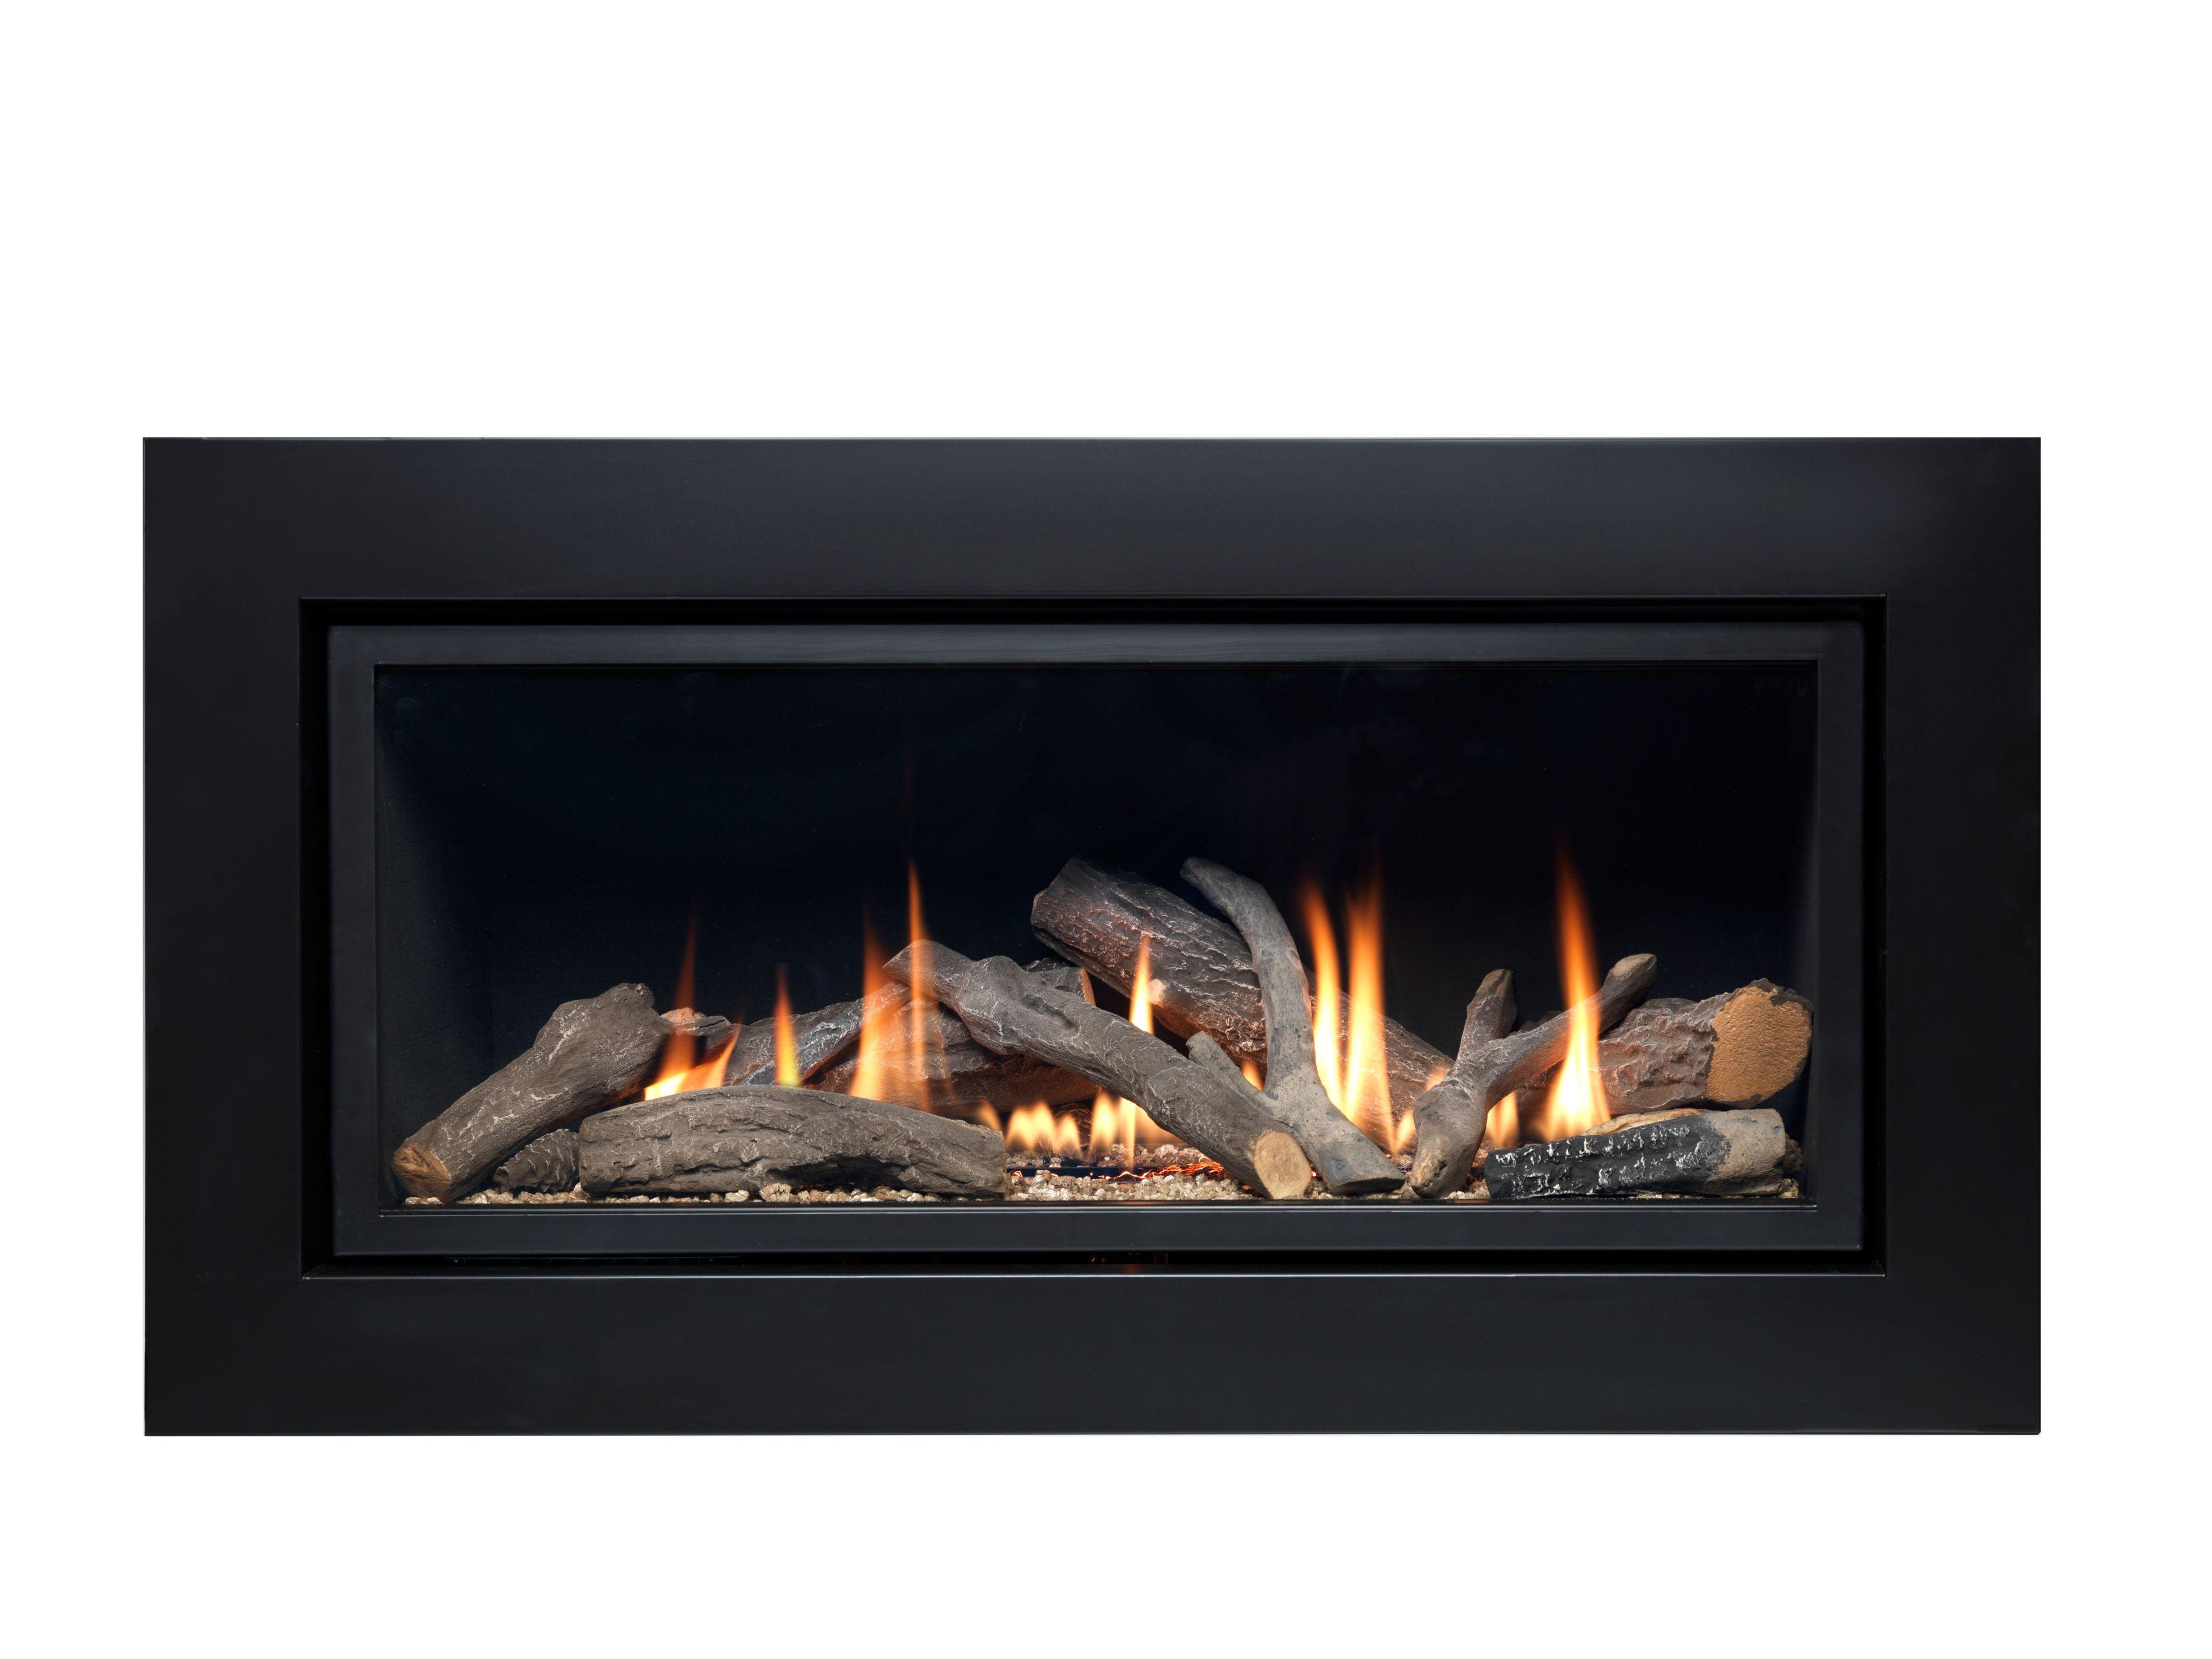 Ignite Pinnacle Black Remote Control Inset Gas Fire